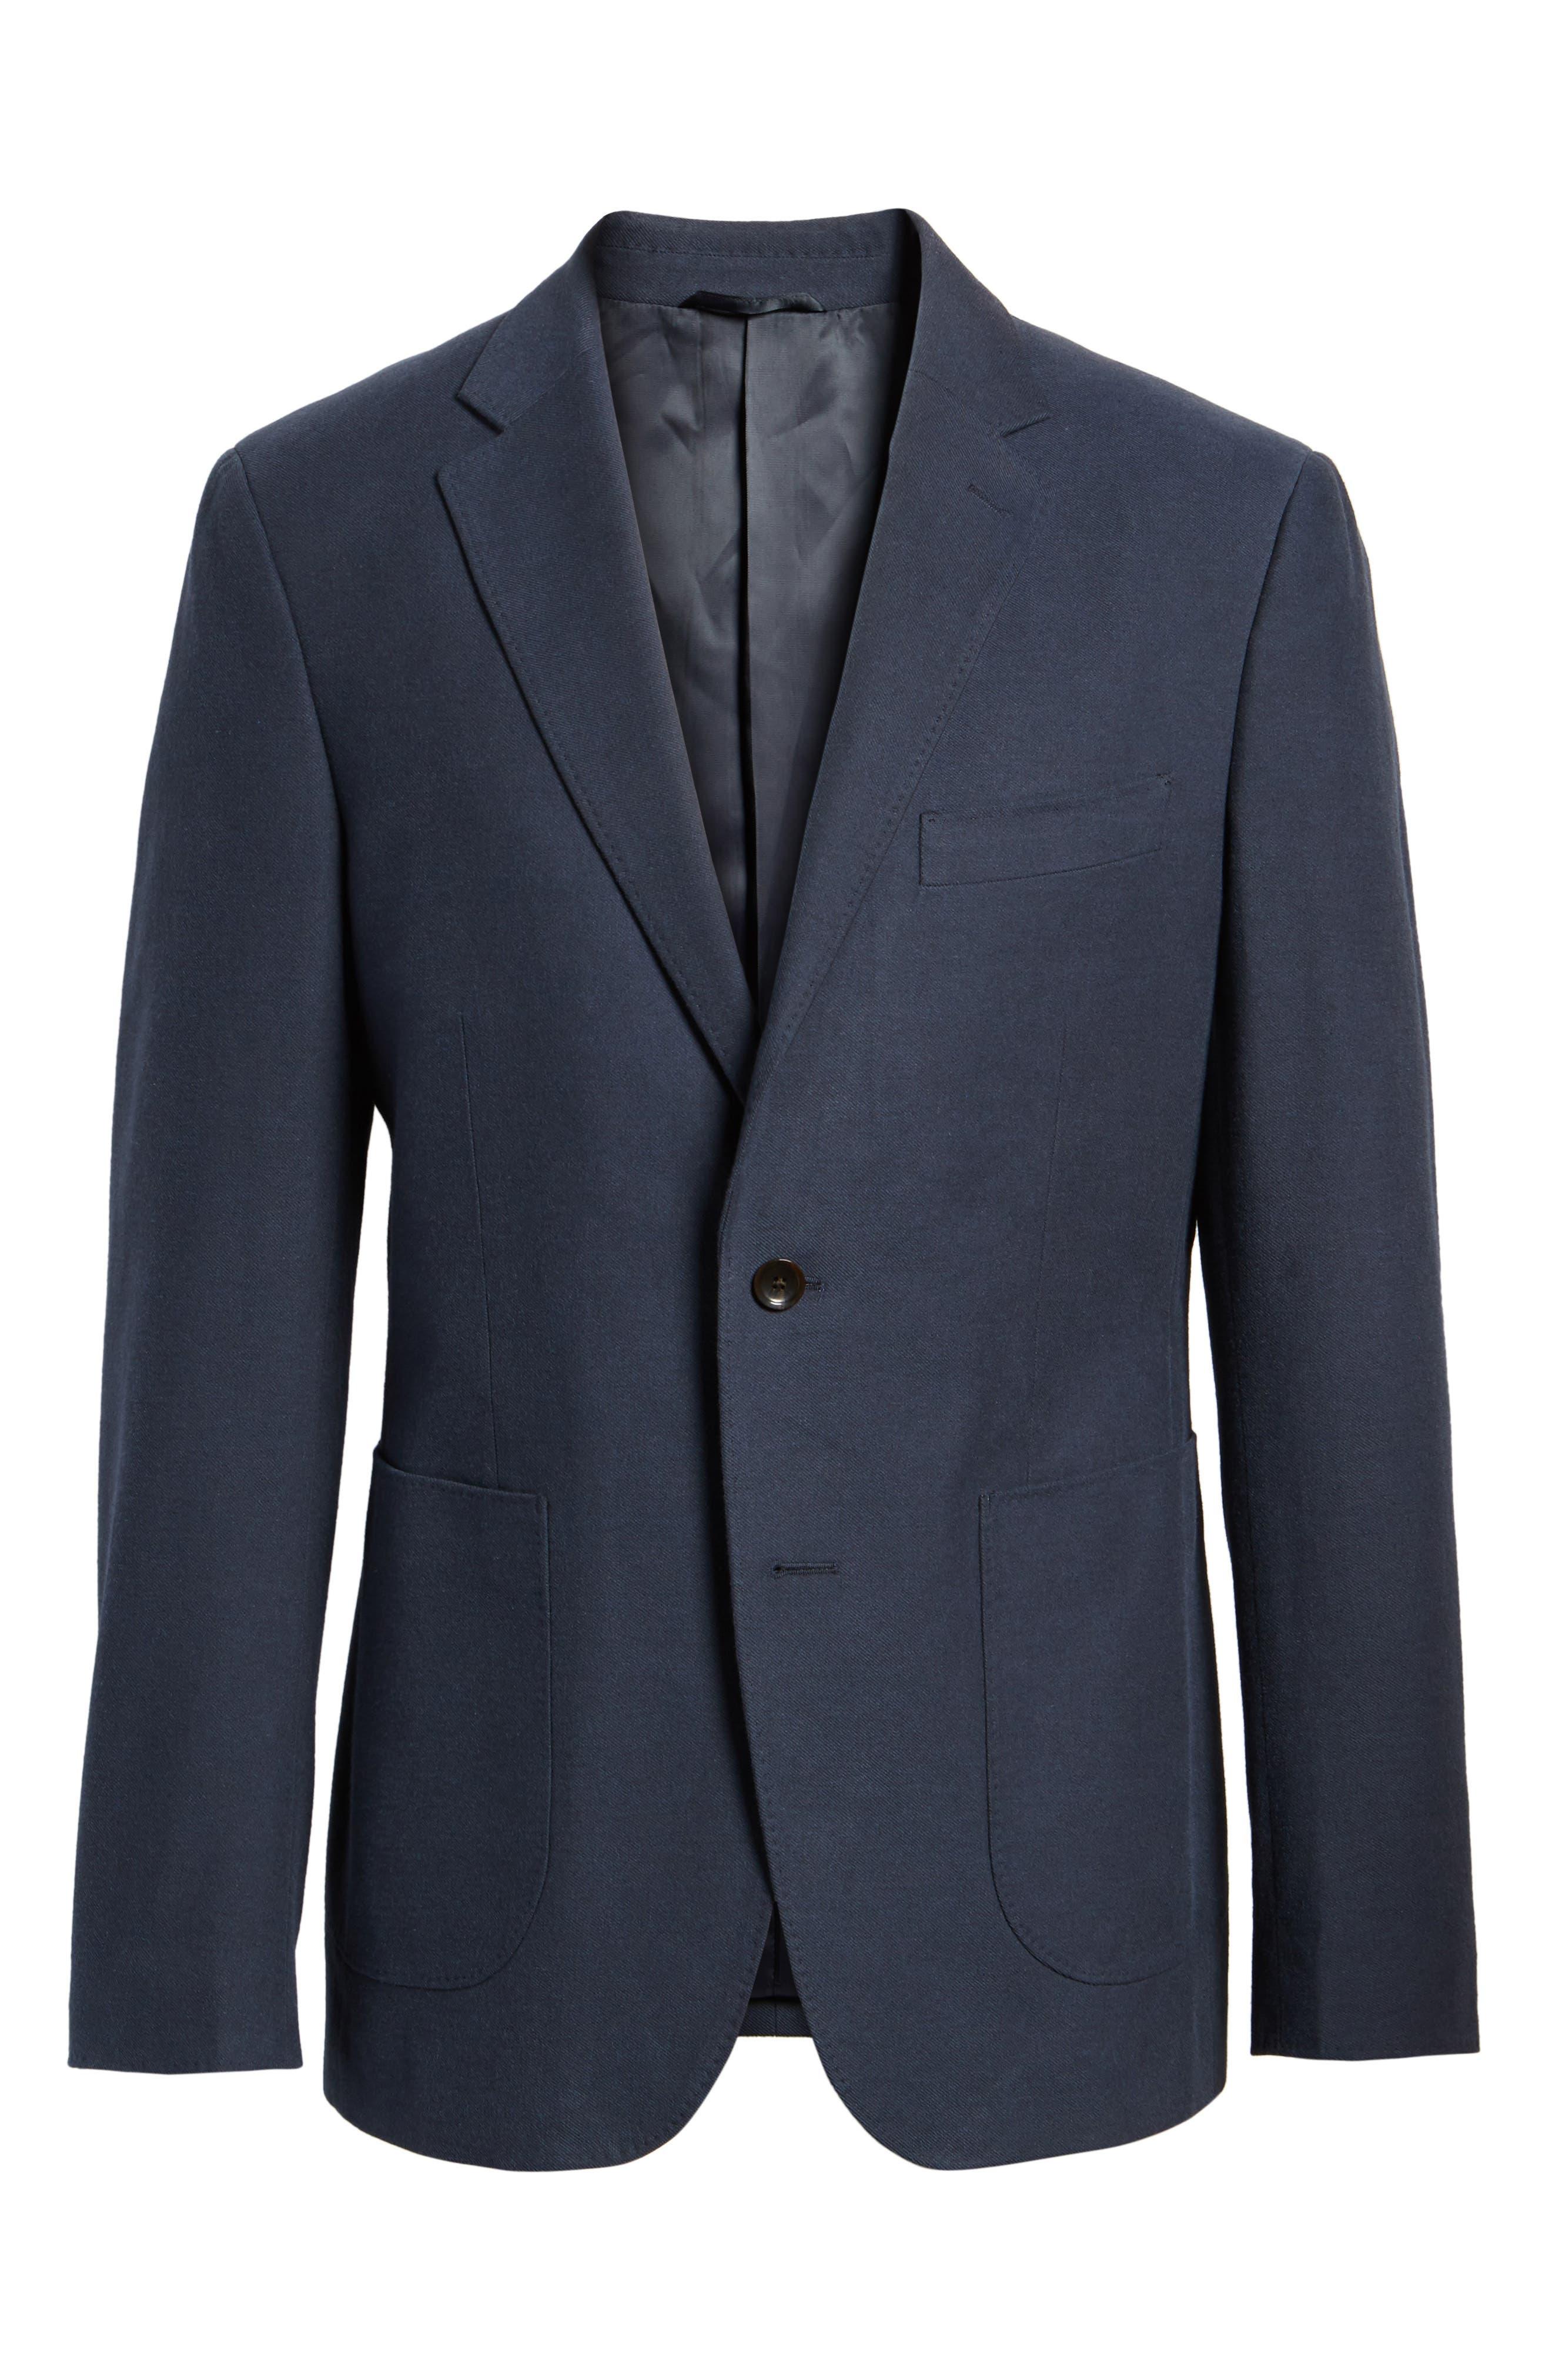 Pembroke Sports Fit Twill Jacket,                             Alternate thumbnail 5, color,                             410